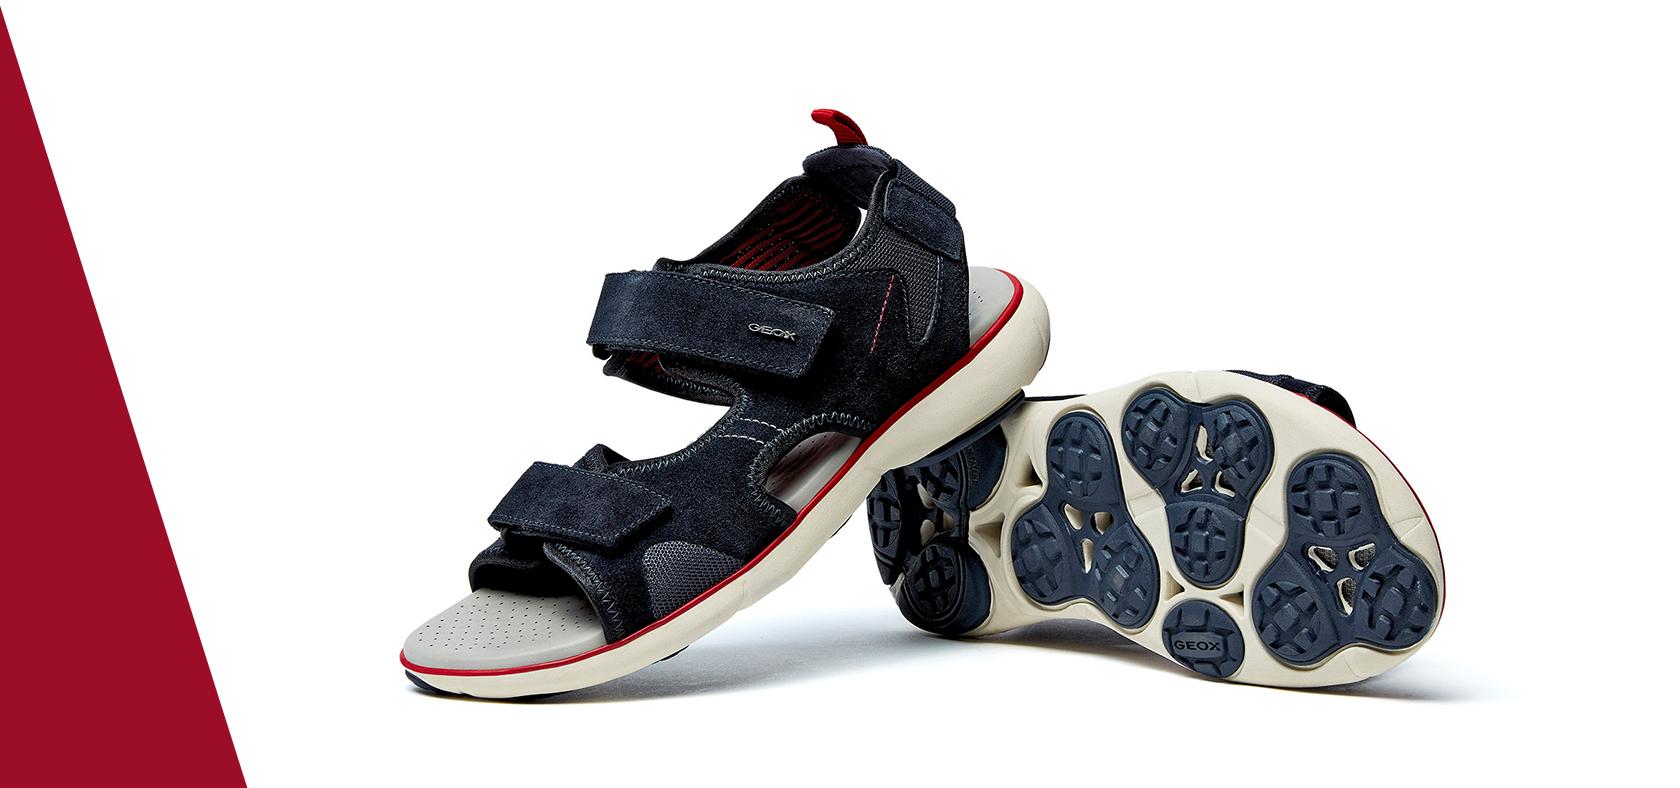 Sandales Pour Homme | Geox